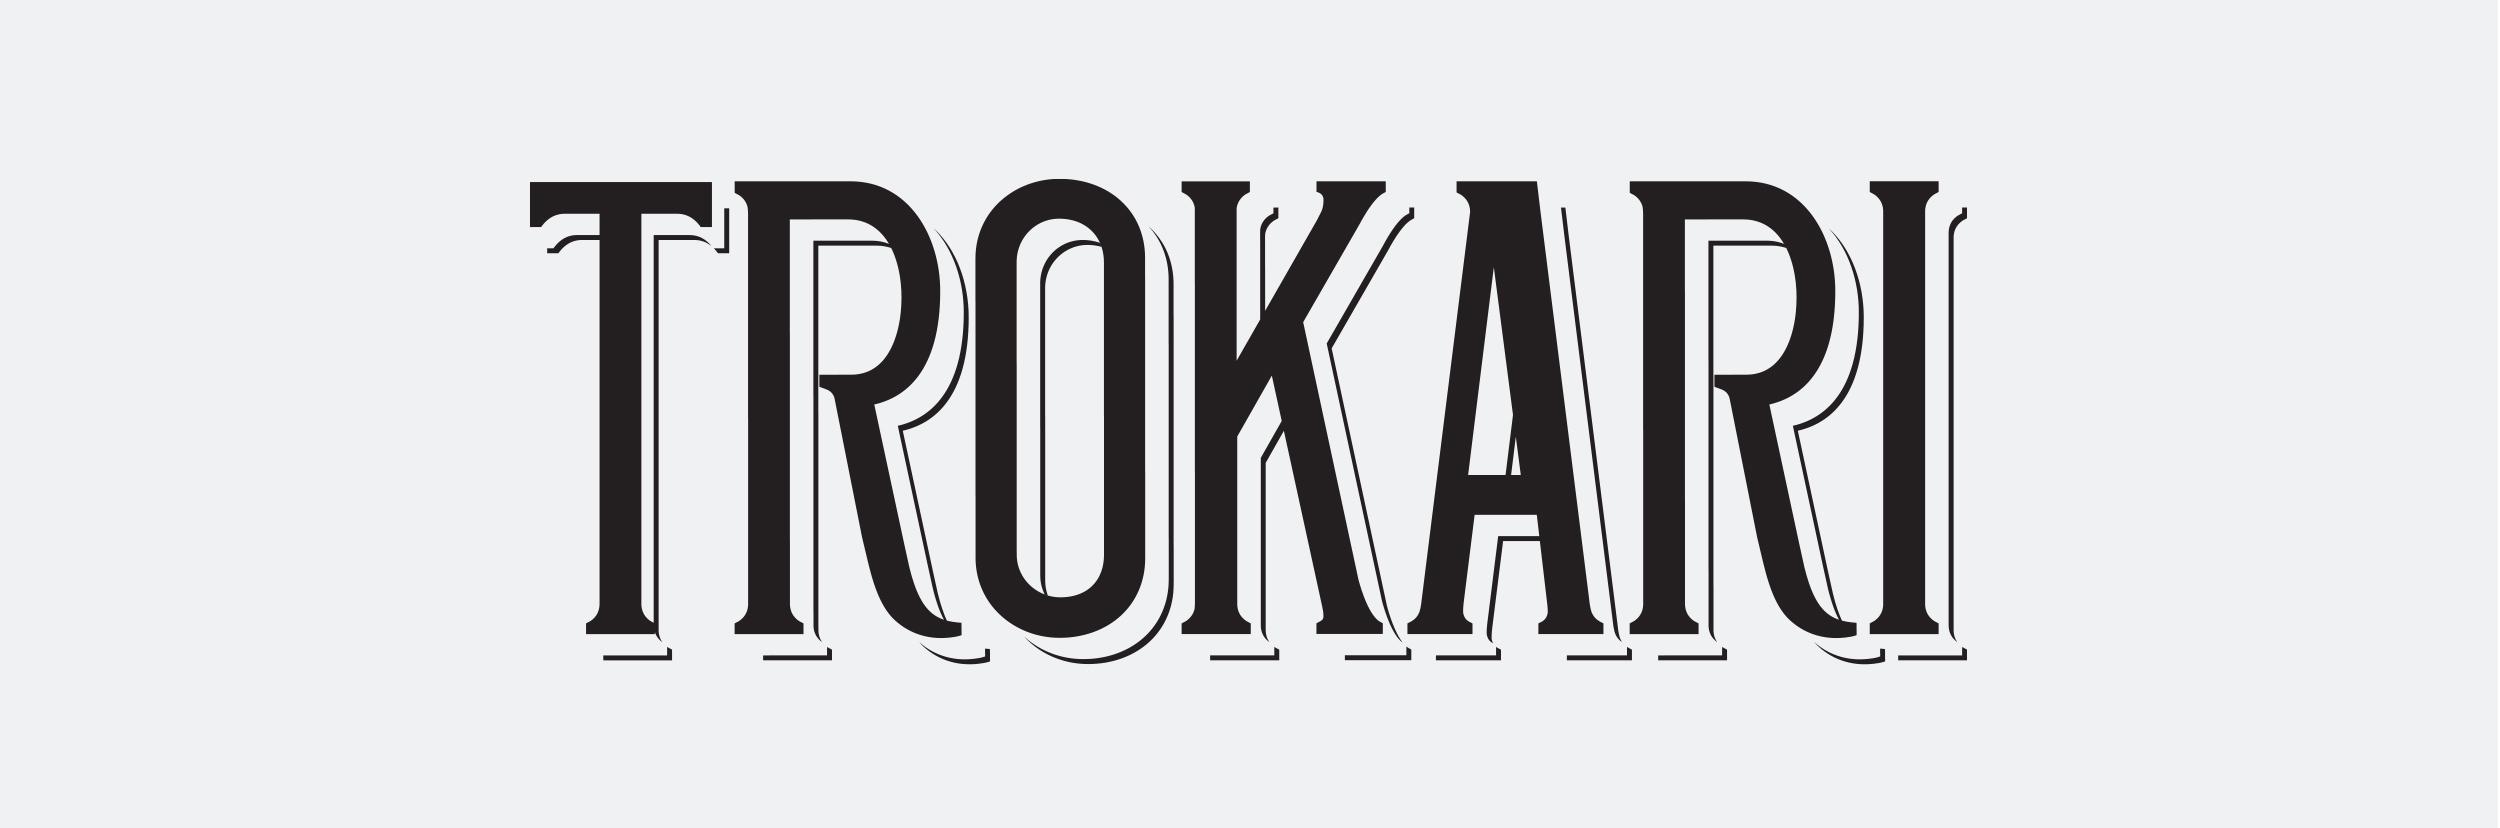 Trokari_Logo